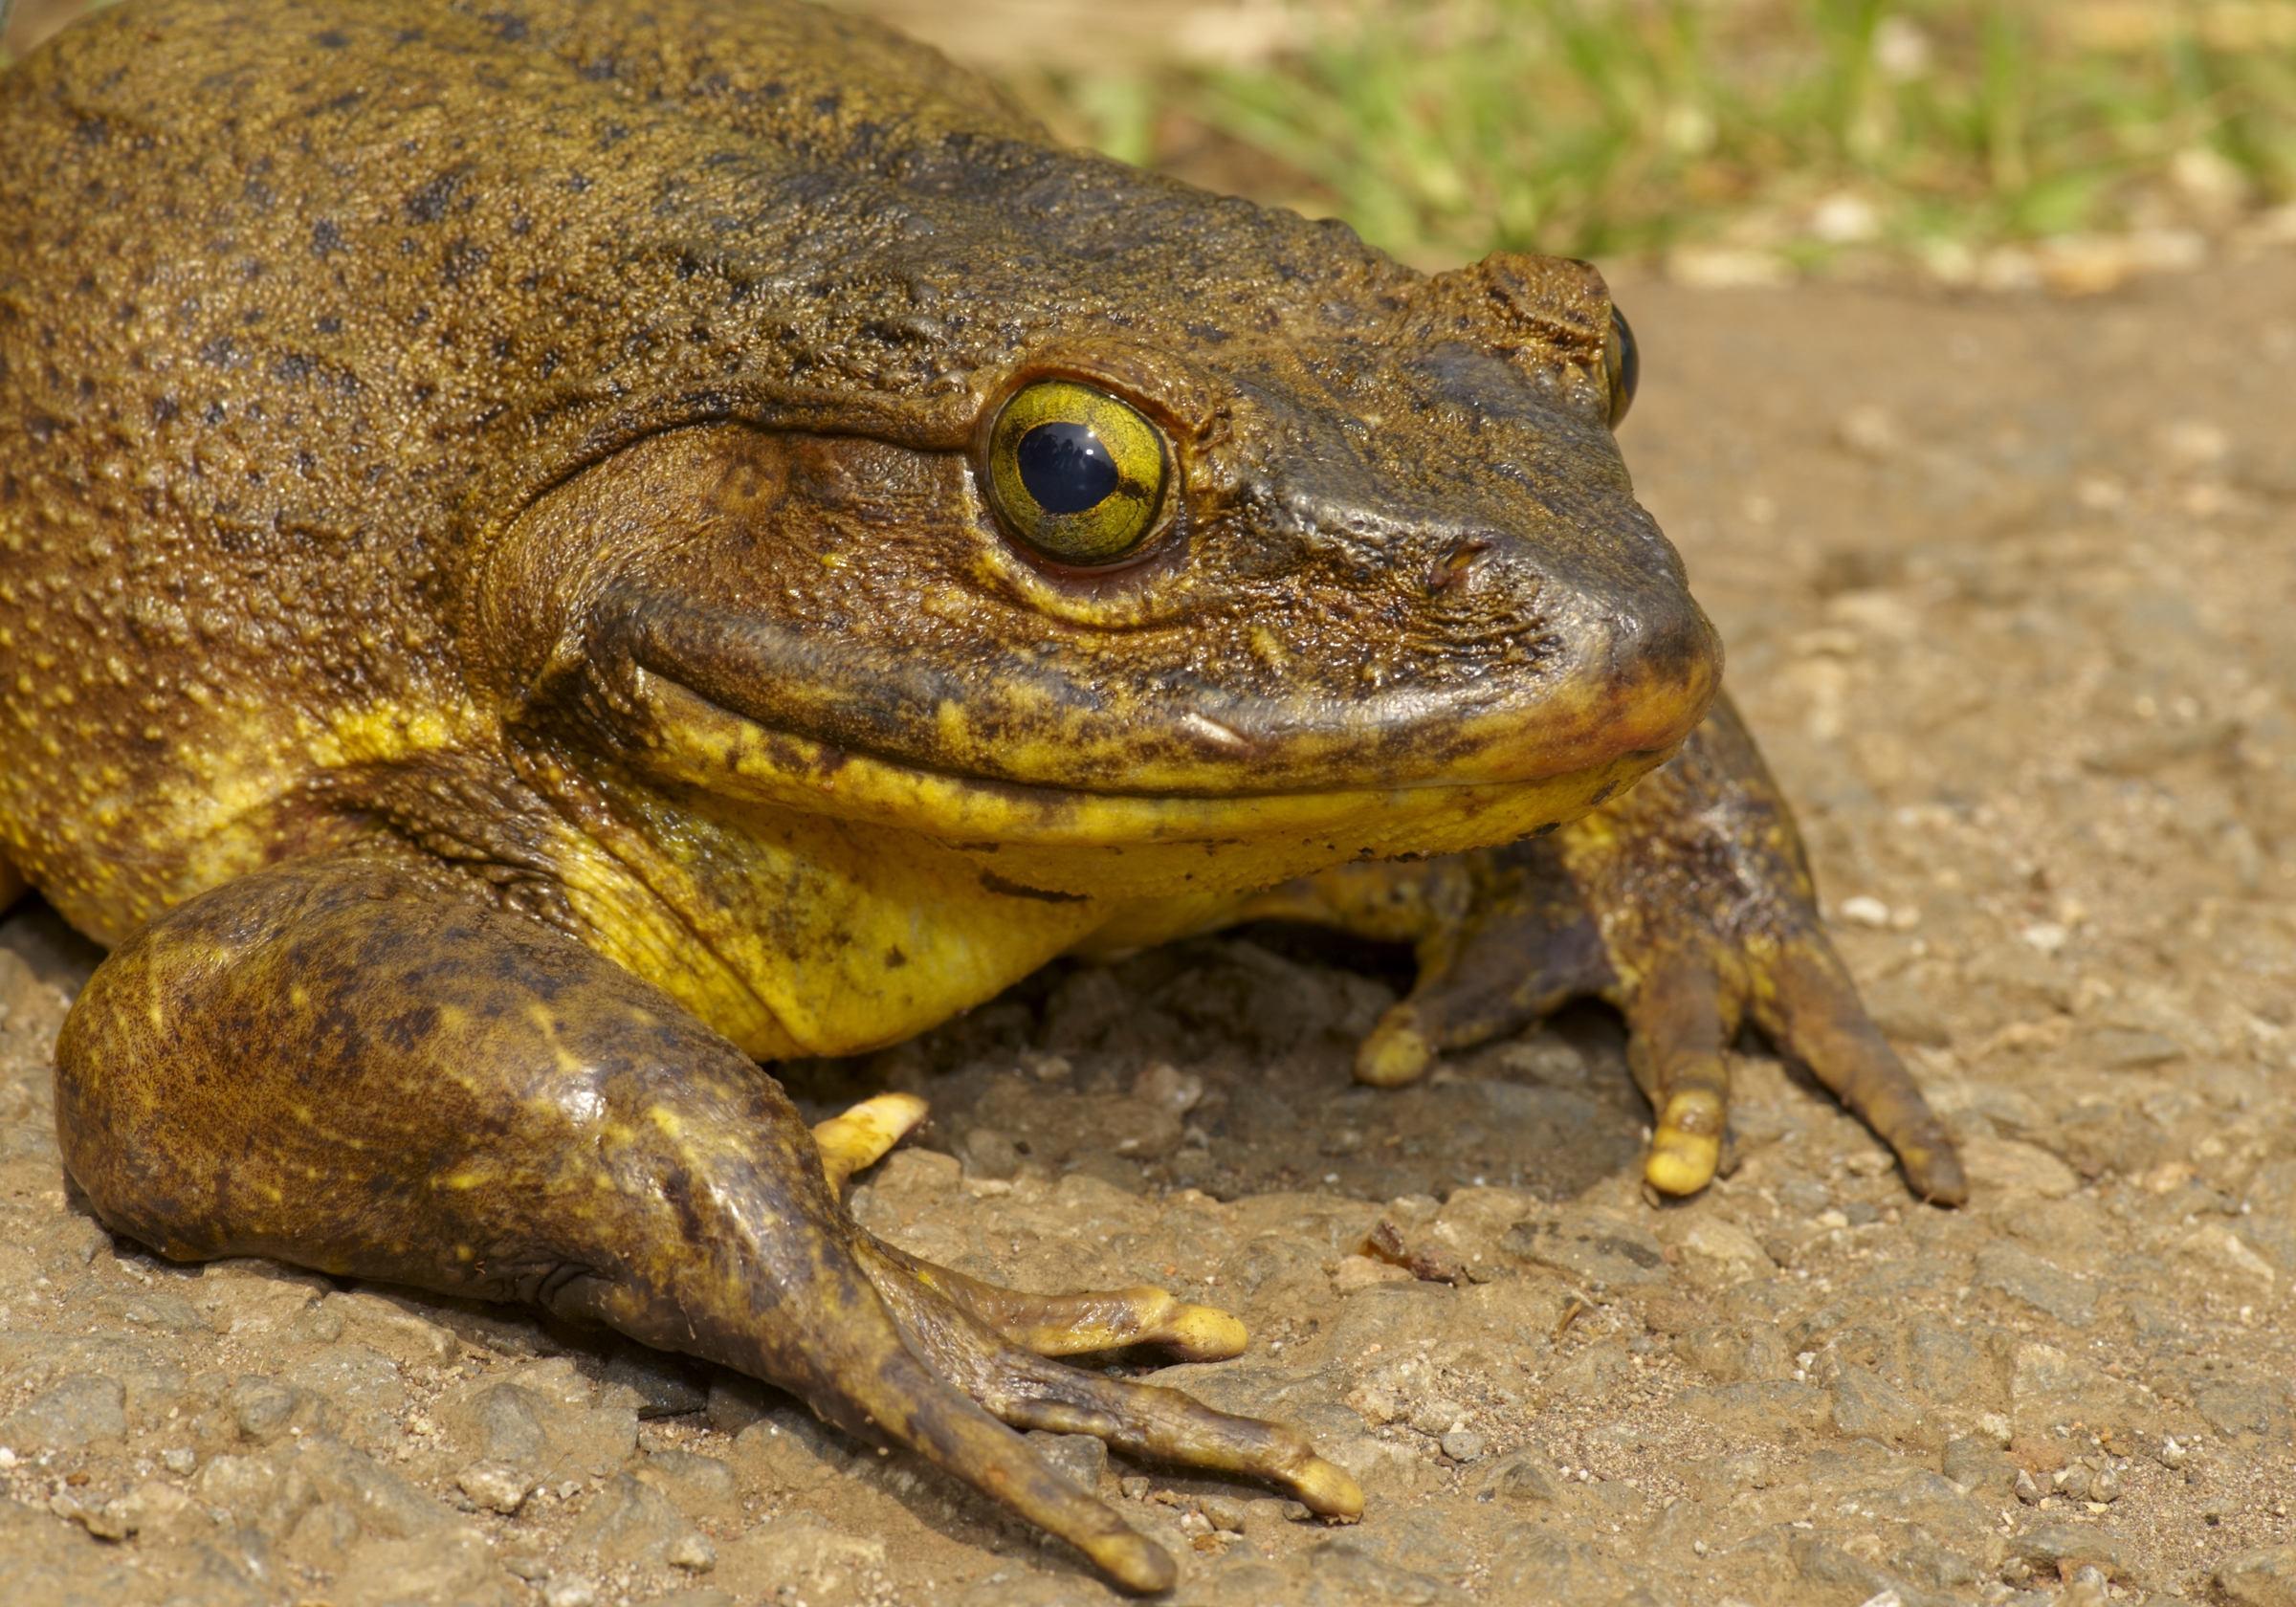 Une grenouille géante ou grenouille goliath